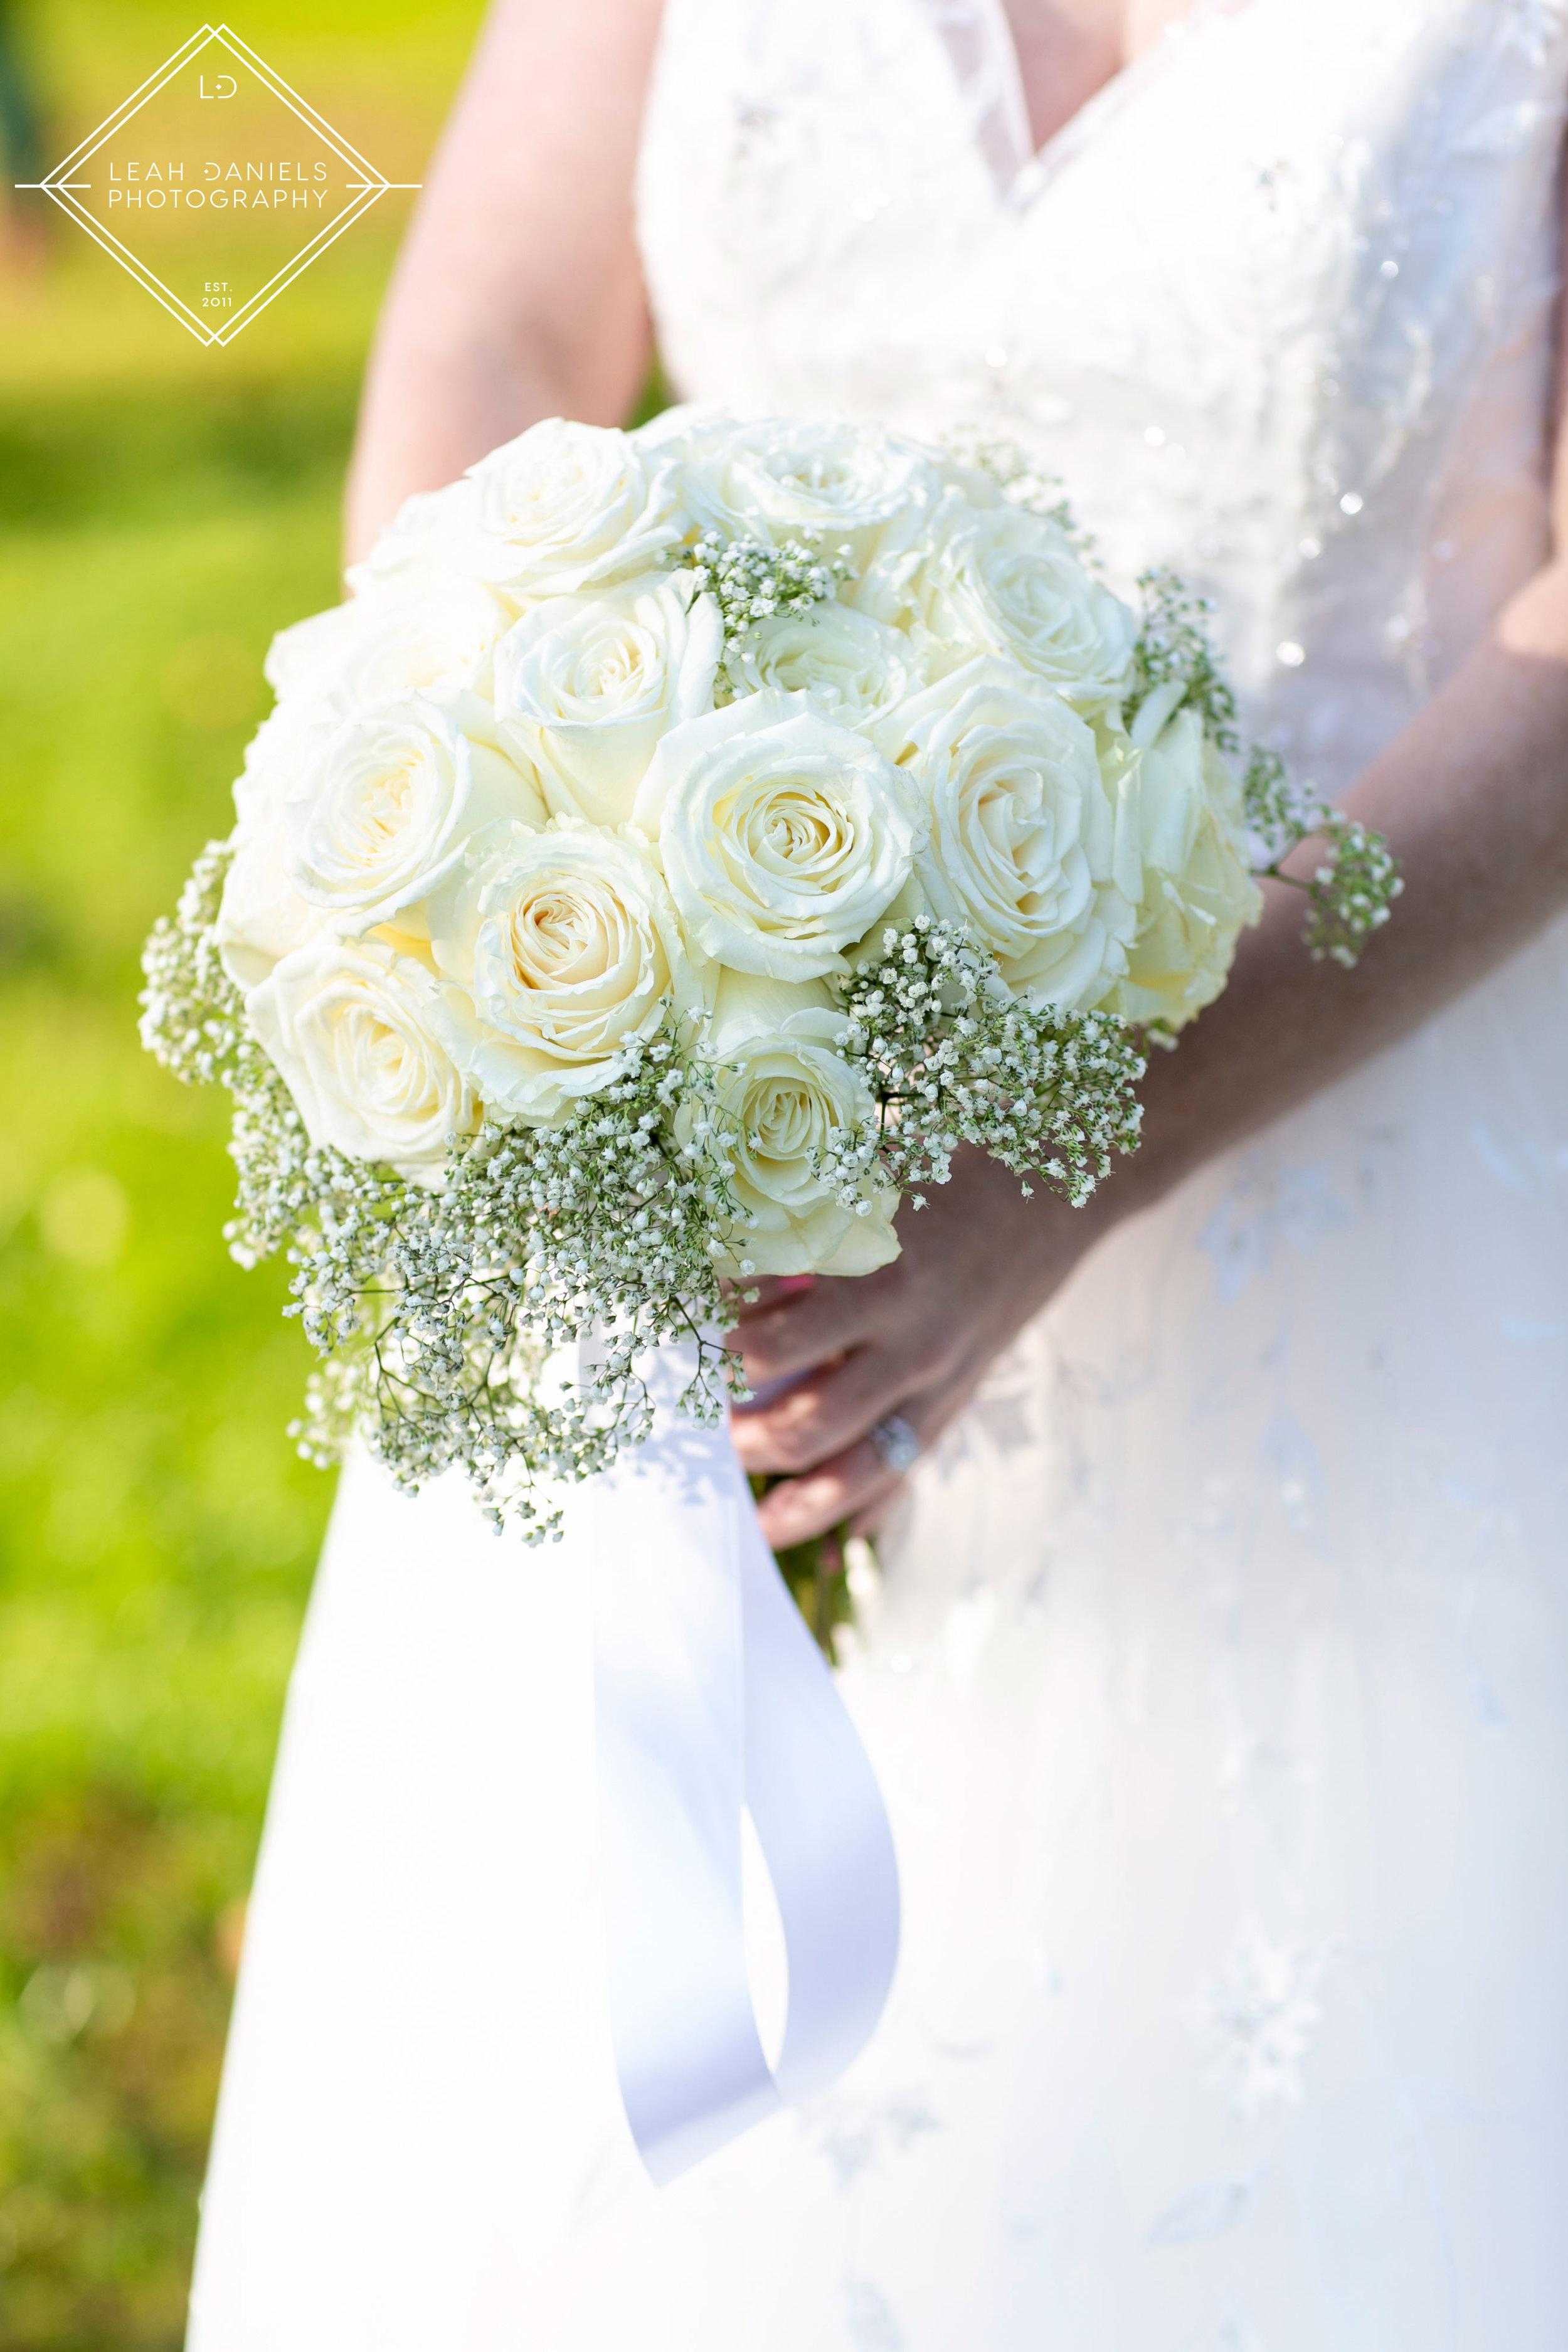 Scranton Wedding Photography - Nay Aug Park - Bouquet